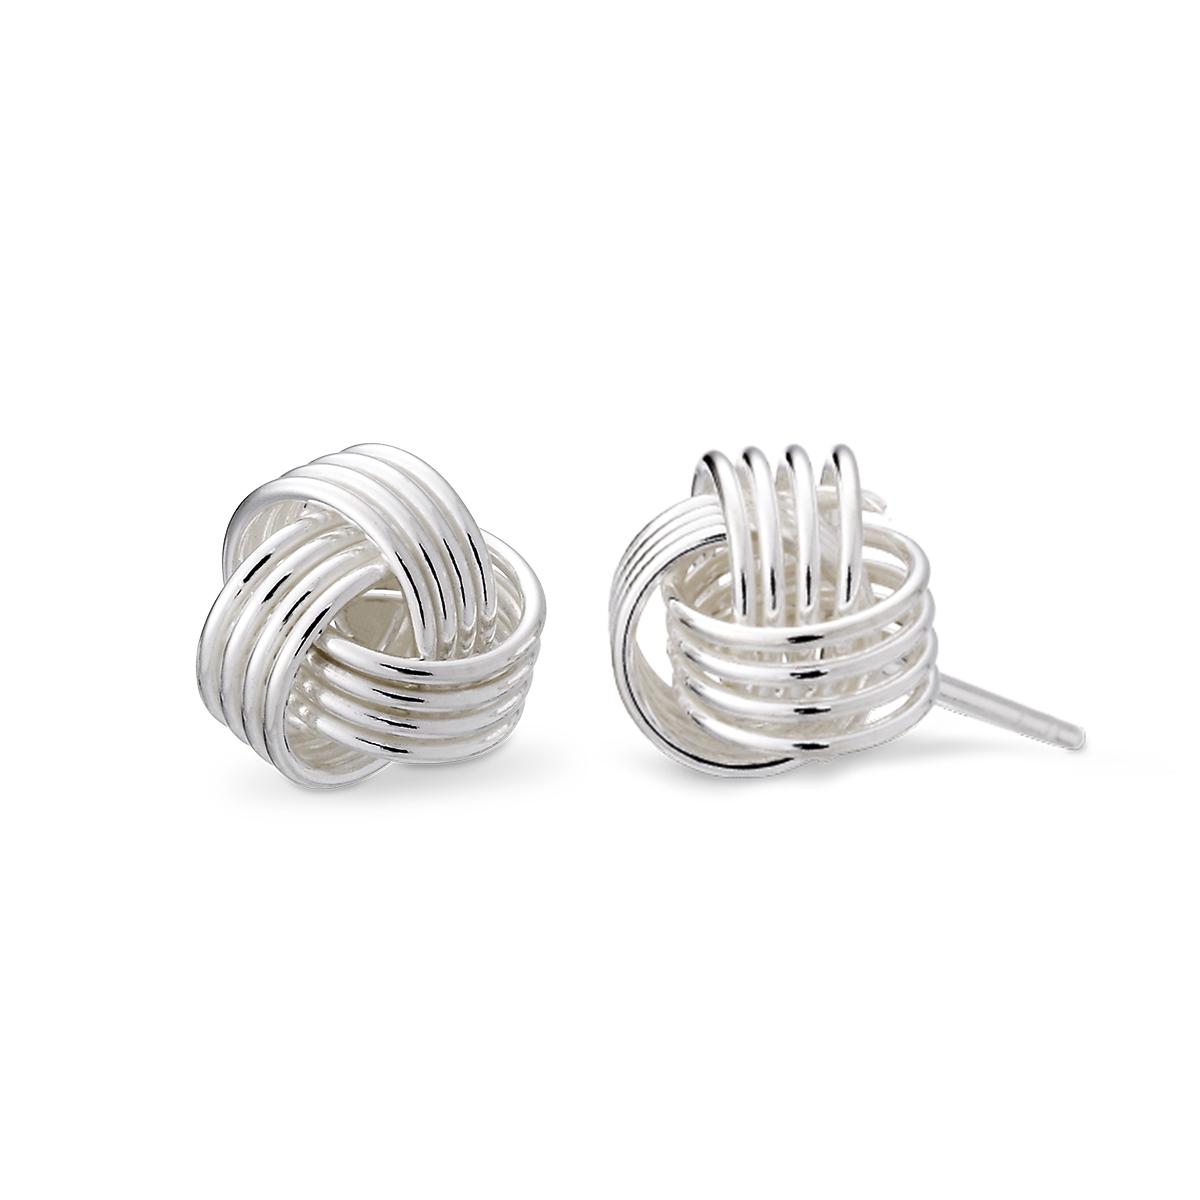 ES118 繽紛時光姊妹耳環|6x6mm/一對販售